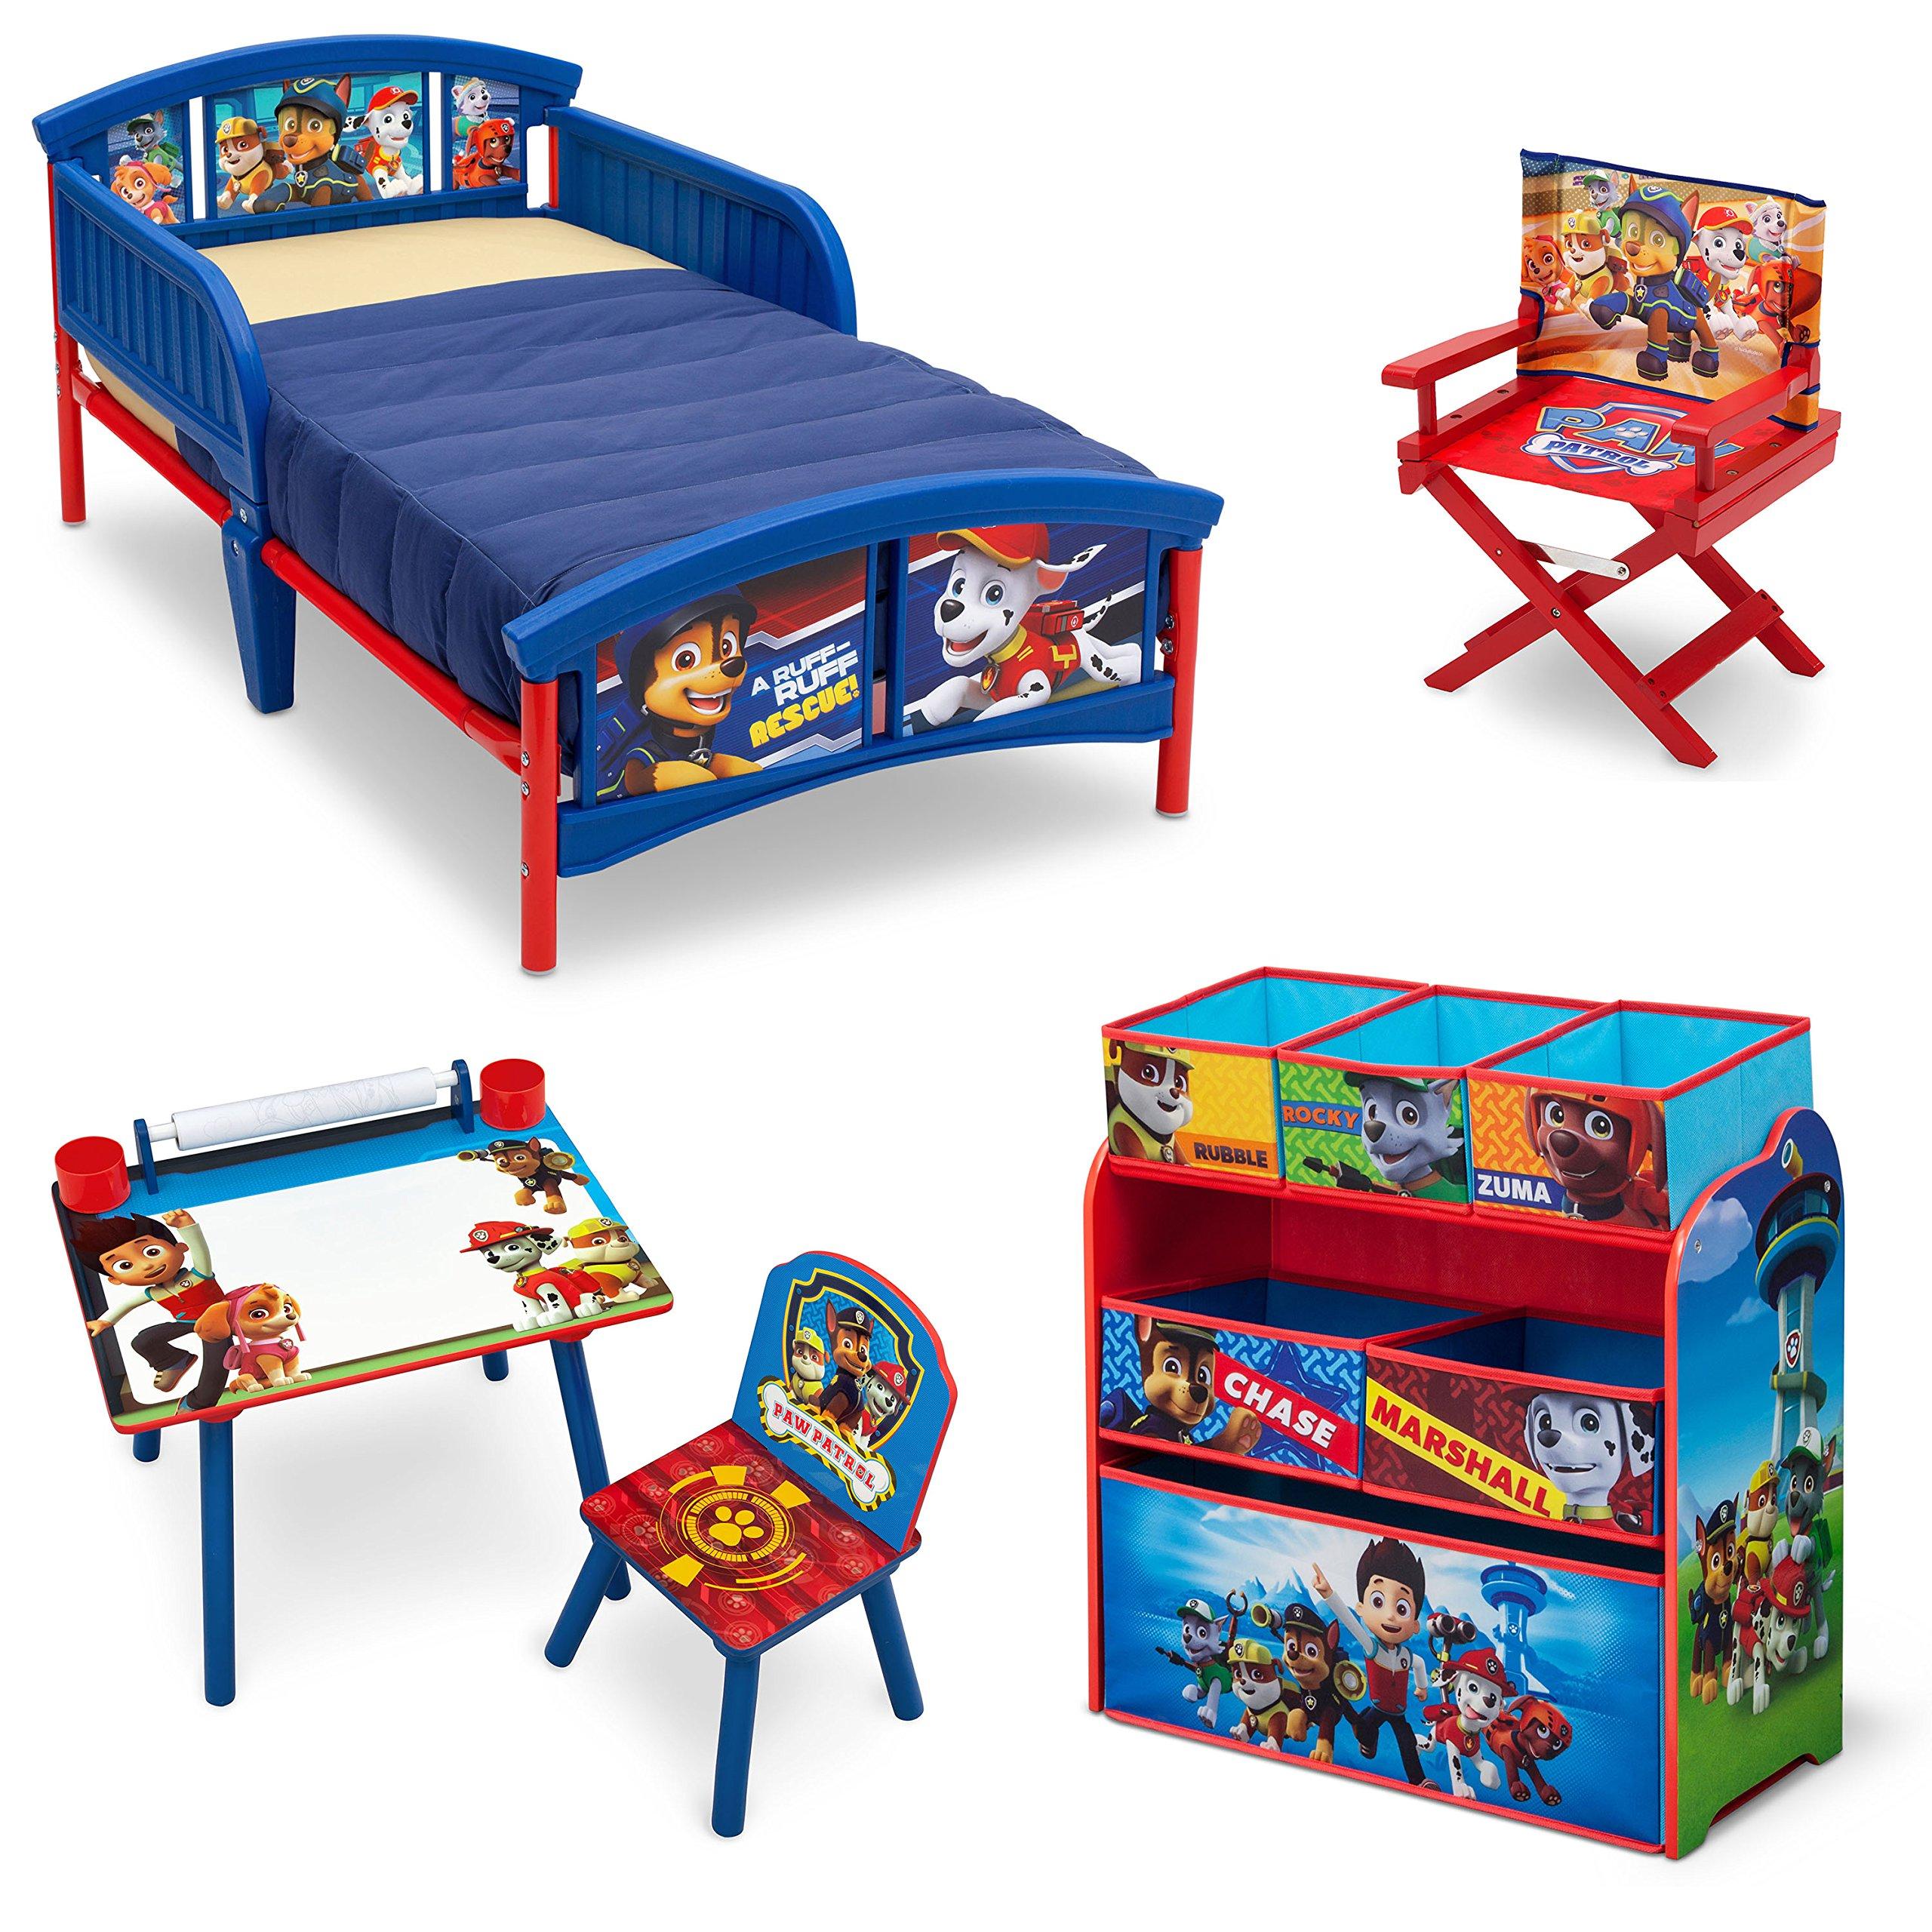 Nick Jr. PAW Patrol Room-in-a-Box with BONUS Chair (Plastic Toddler Bed, Multi-Bin Organizer, Art Desk, Director's Chair)